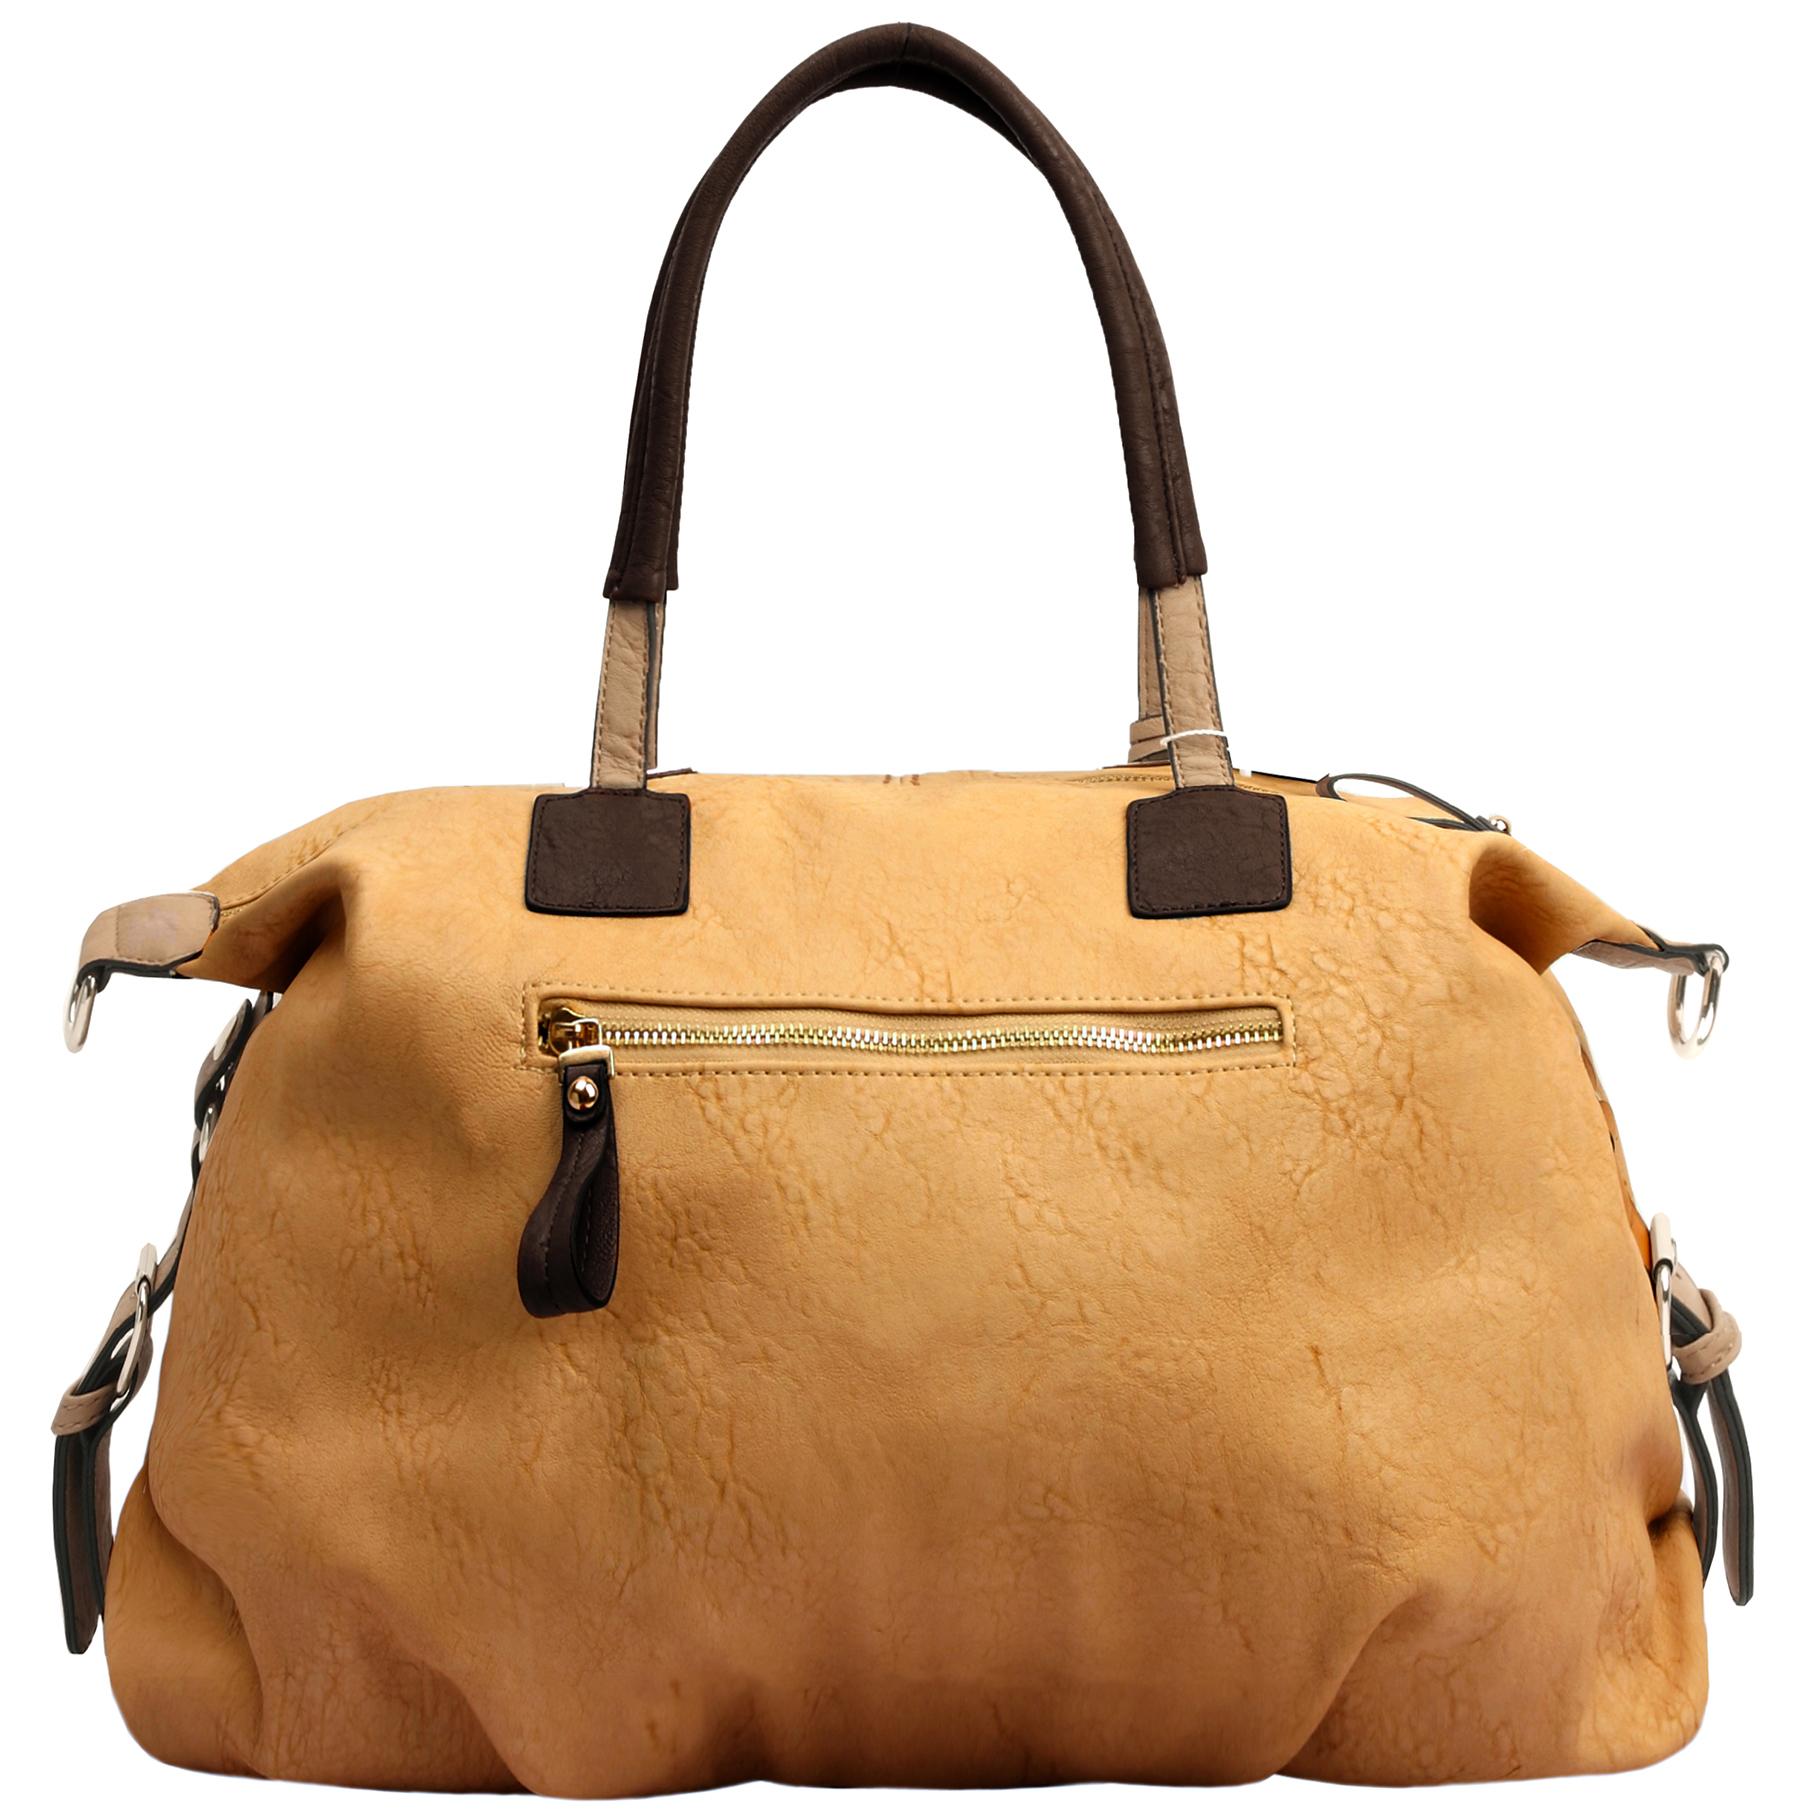 ACACIA Caramel Large Everyday Shopper Hobo Handbag Back